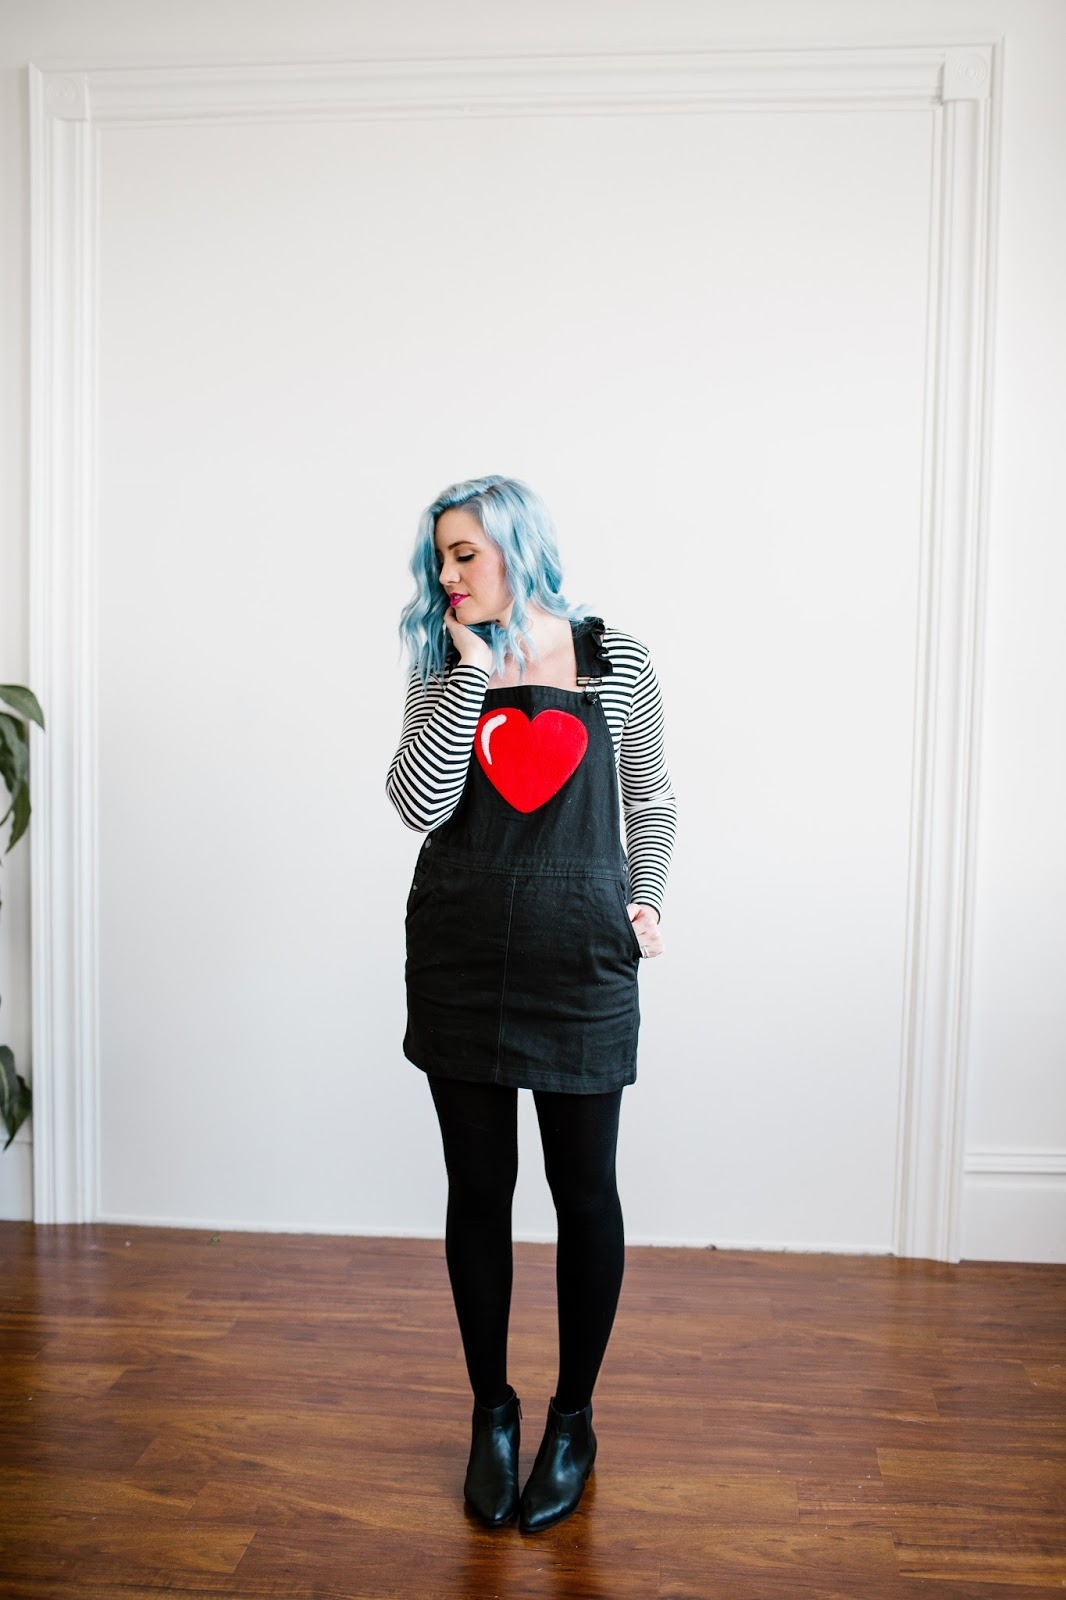 ASOS Overalls, Utah Fashion Blogger, Valentines